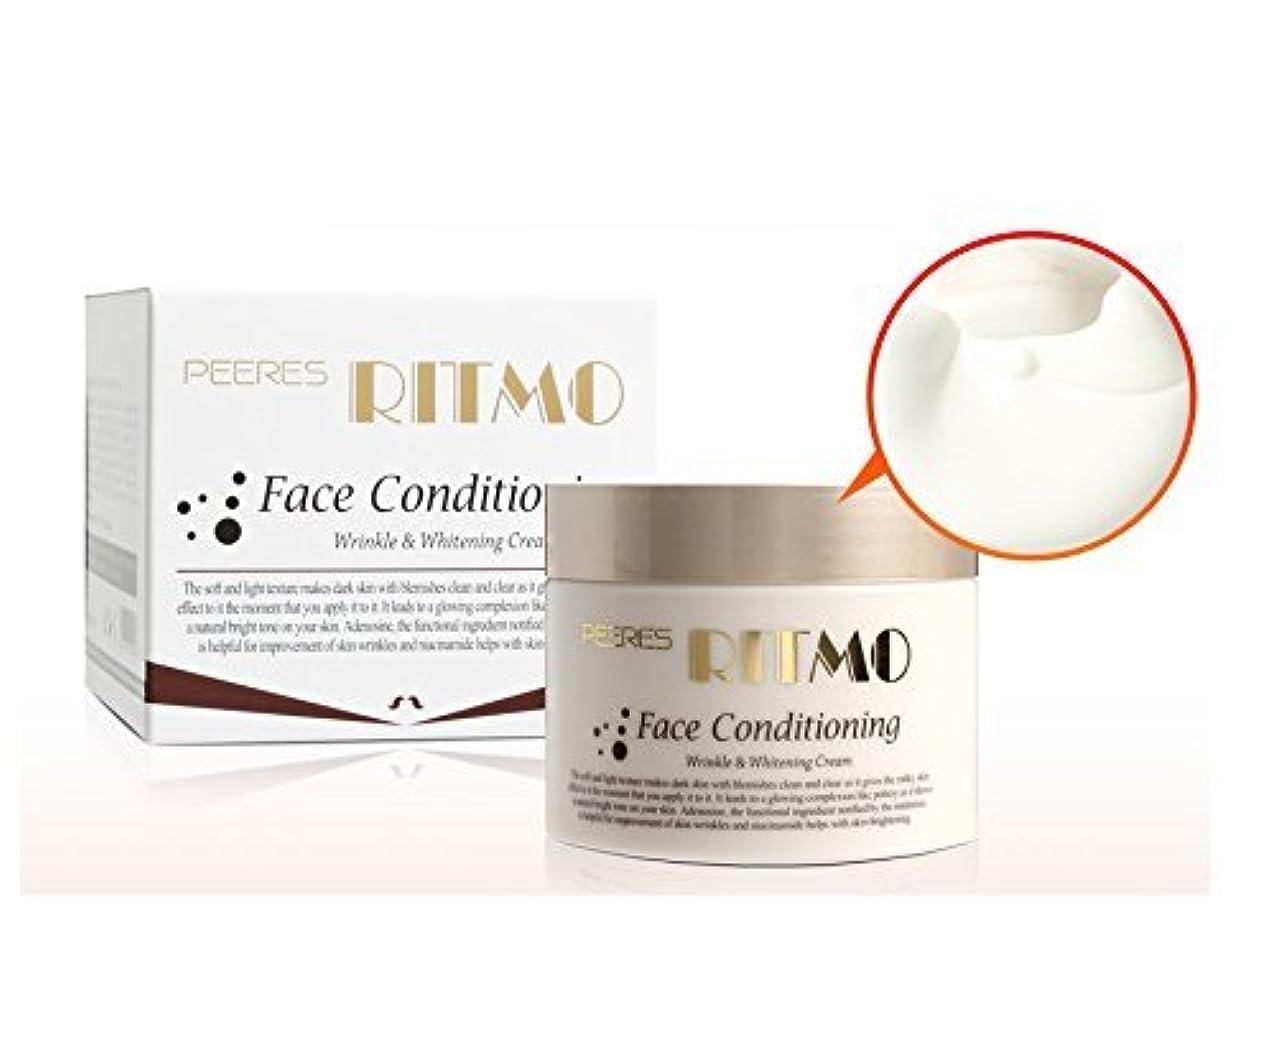 [Ritmo] フェイスコンディショニングホワイトニングクリーム100ml/Face Conditioning Whitening Cream 100ml/ソフトや照明/Soft and lighting/韓国化粧品/Korean Cosmetics [並行輸入品]